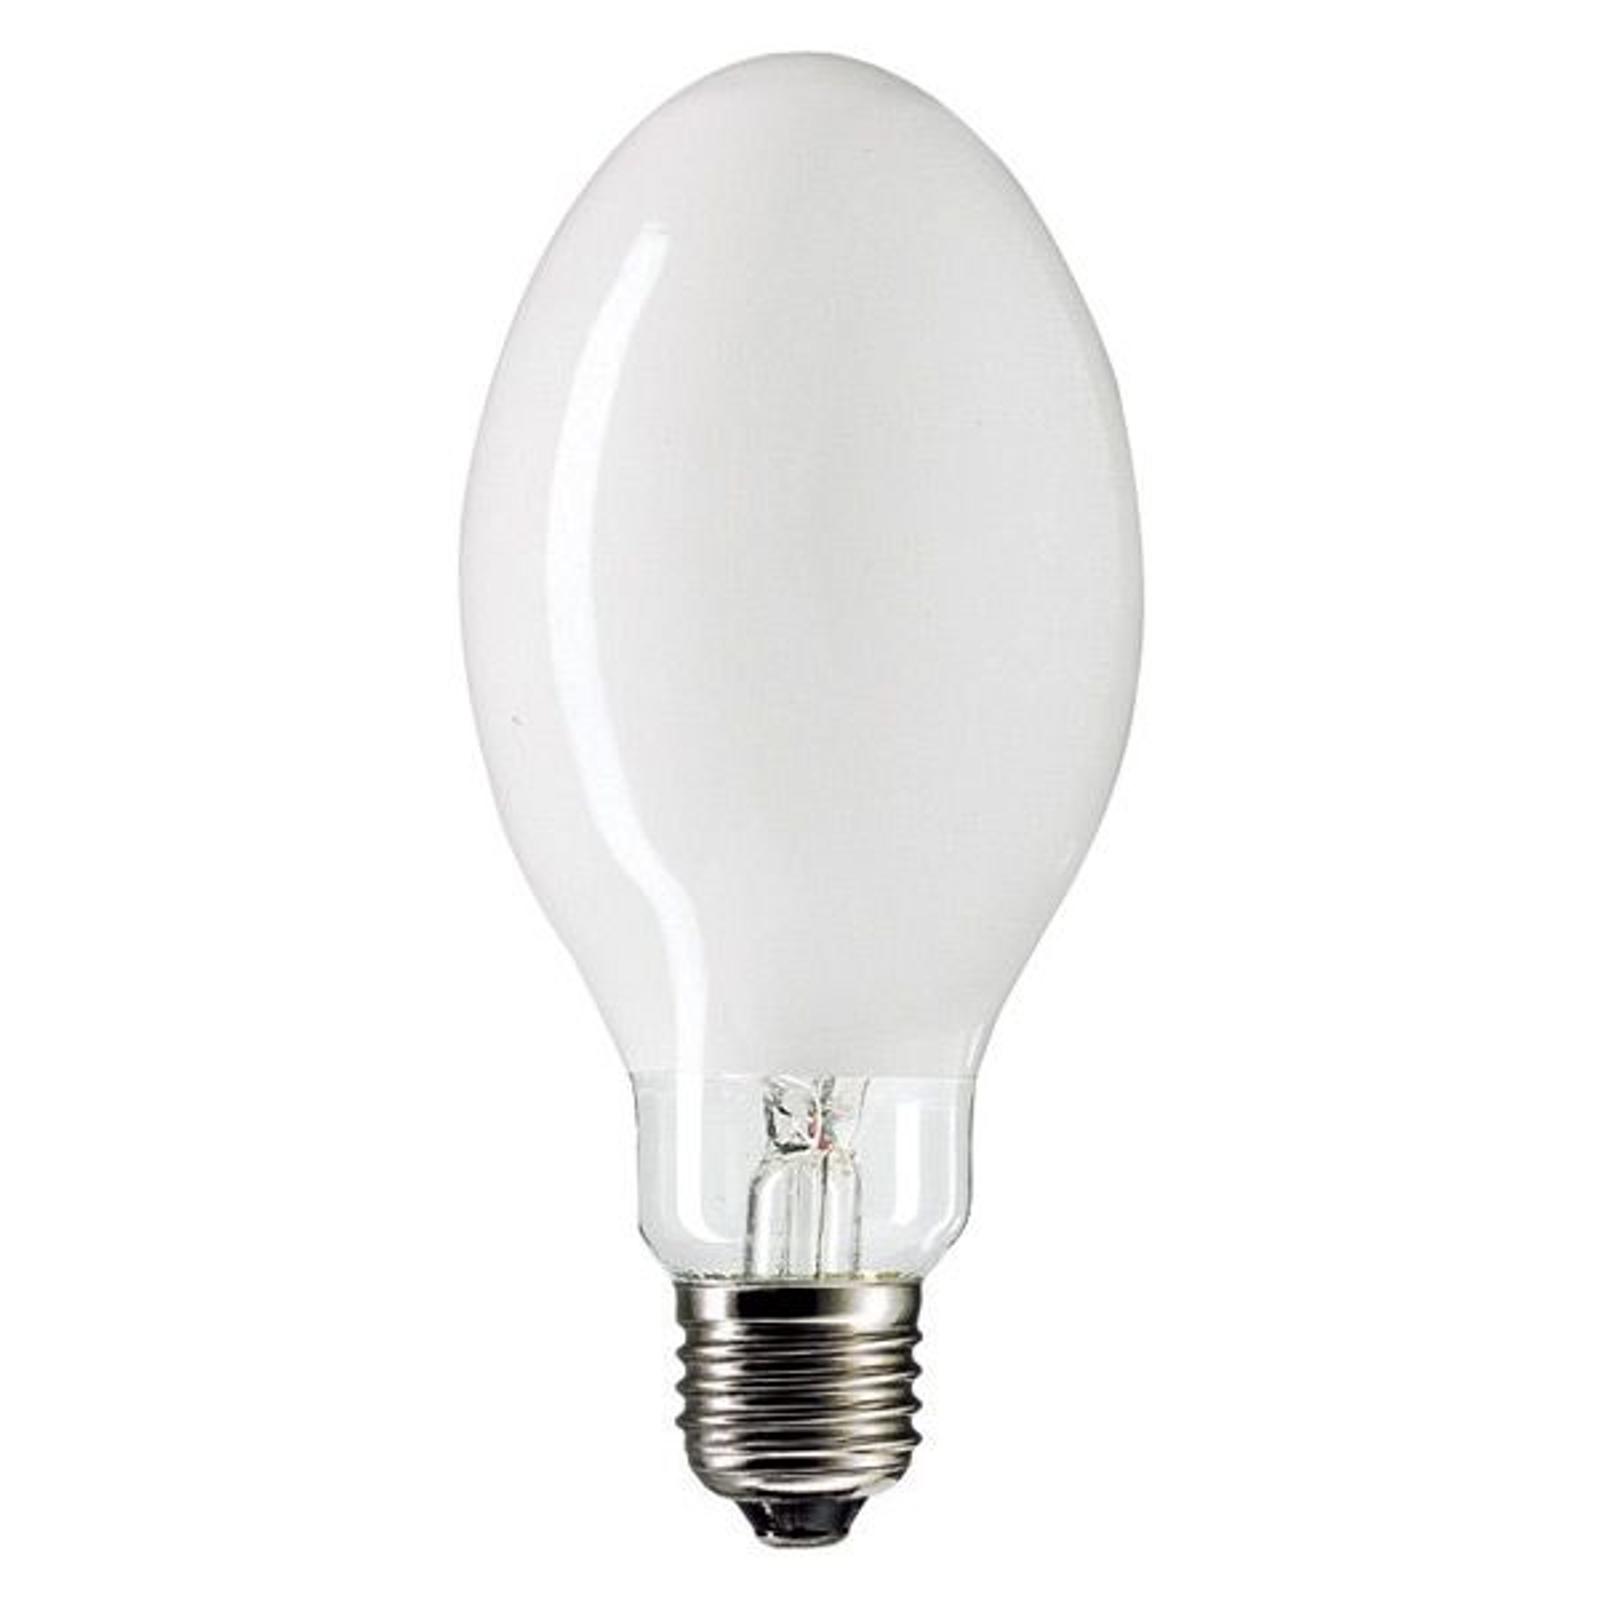 E40 100W 828 lampa metalohalogenkowa Master CDO-ET